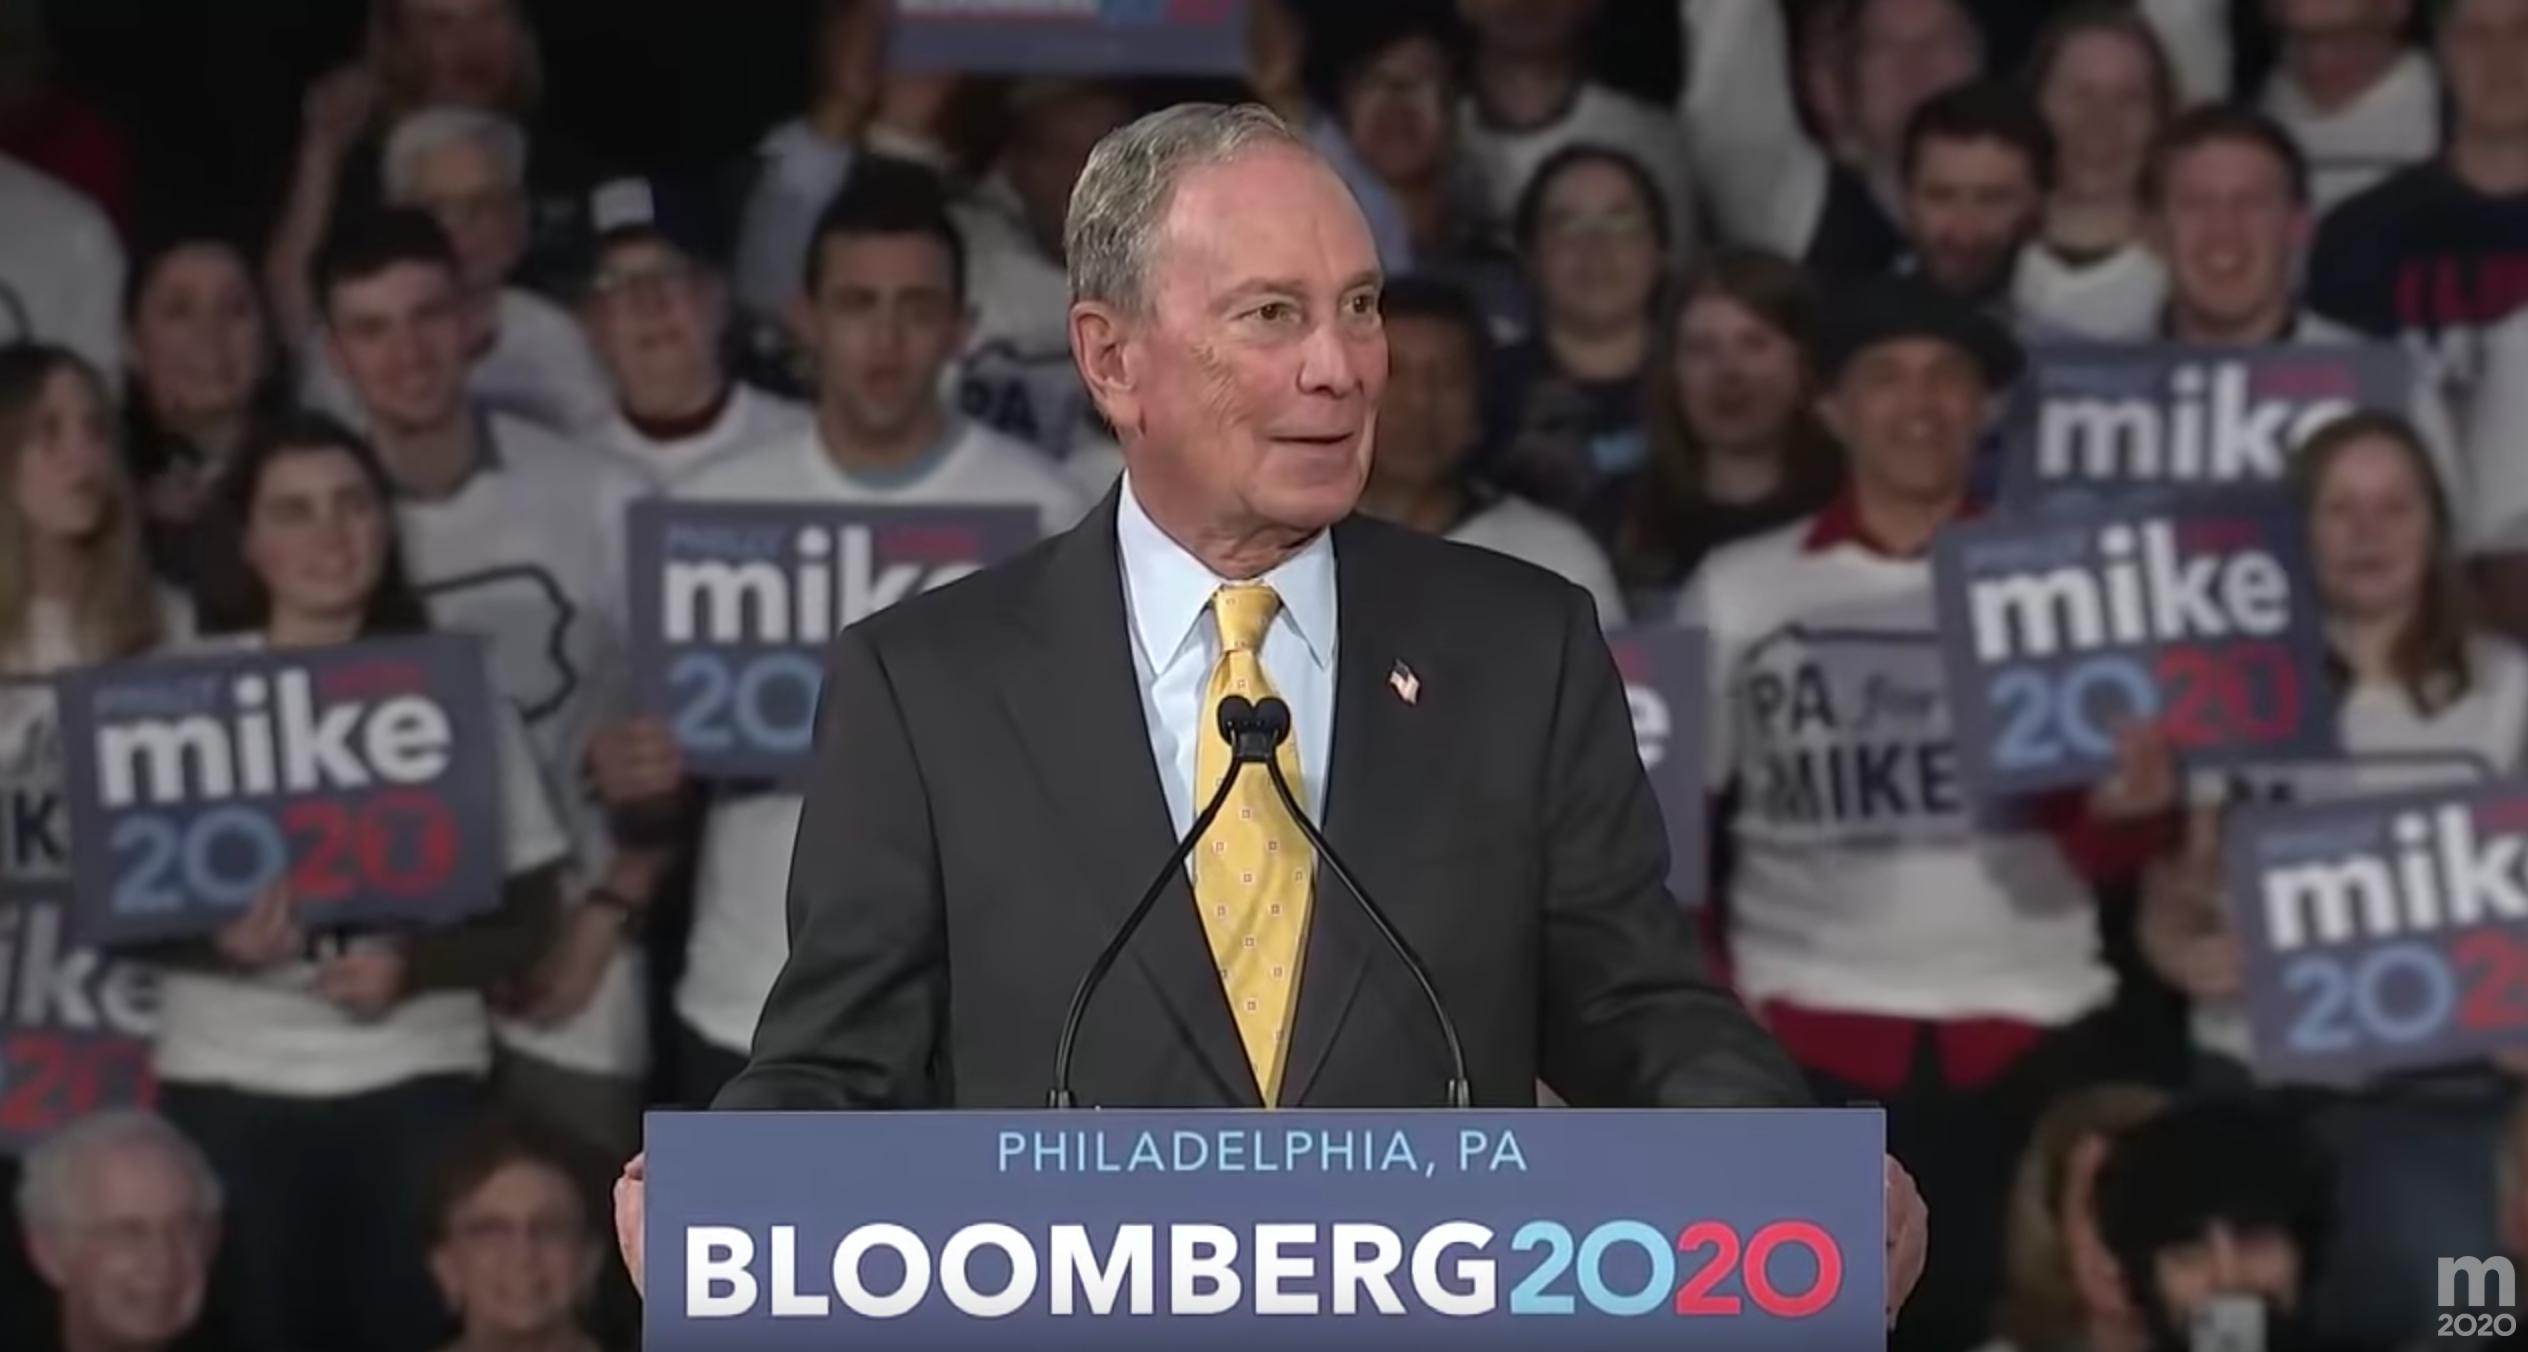 Mike 2020 Rally in Philadelphia, PA (Live Stream)